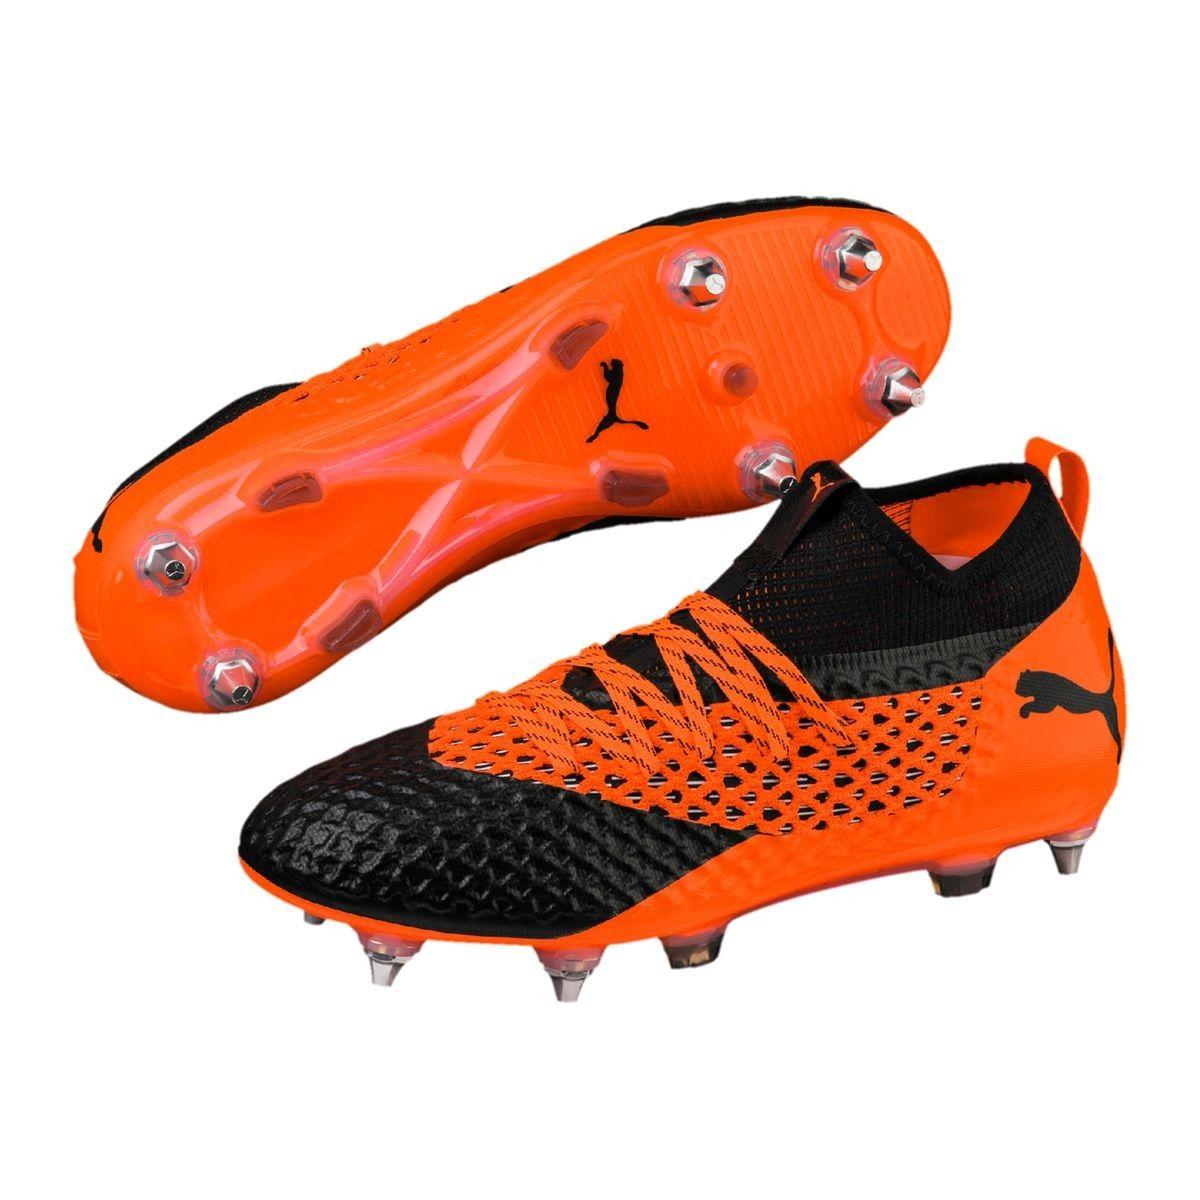 chaussure de foot enfant puma